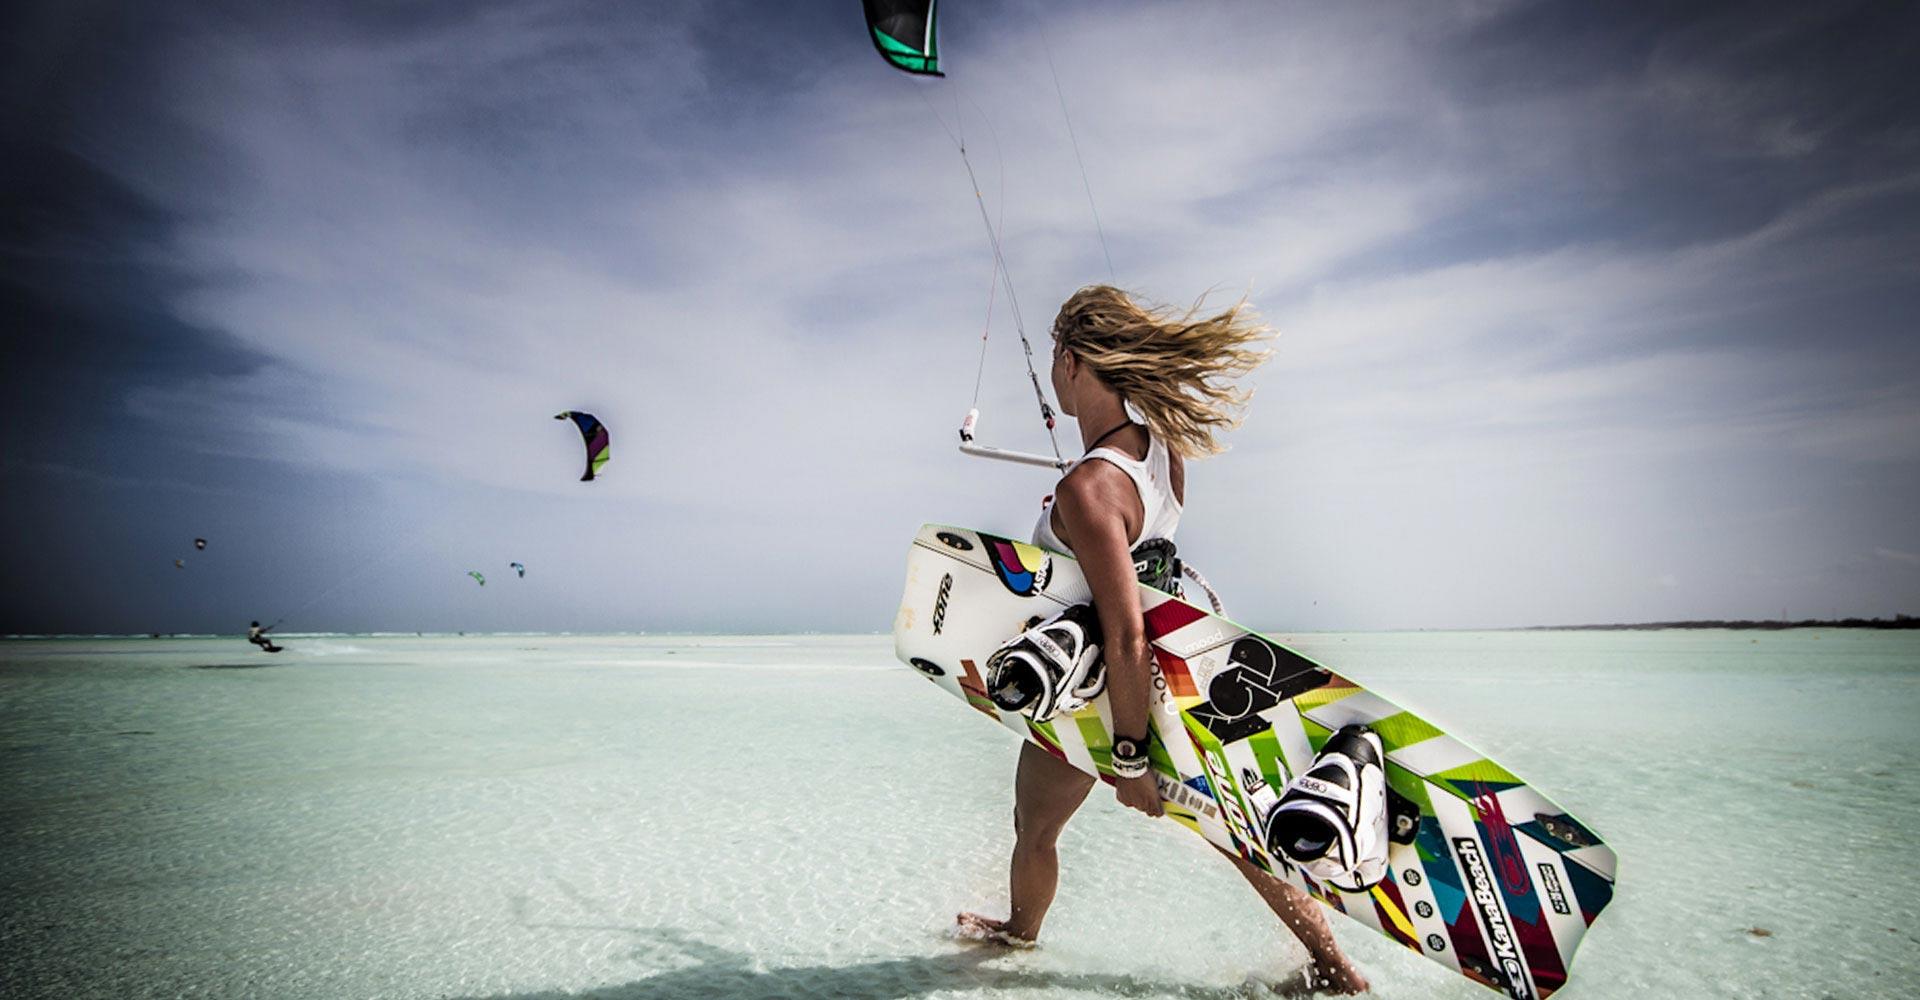 kitesurfing tjej